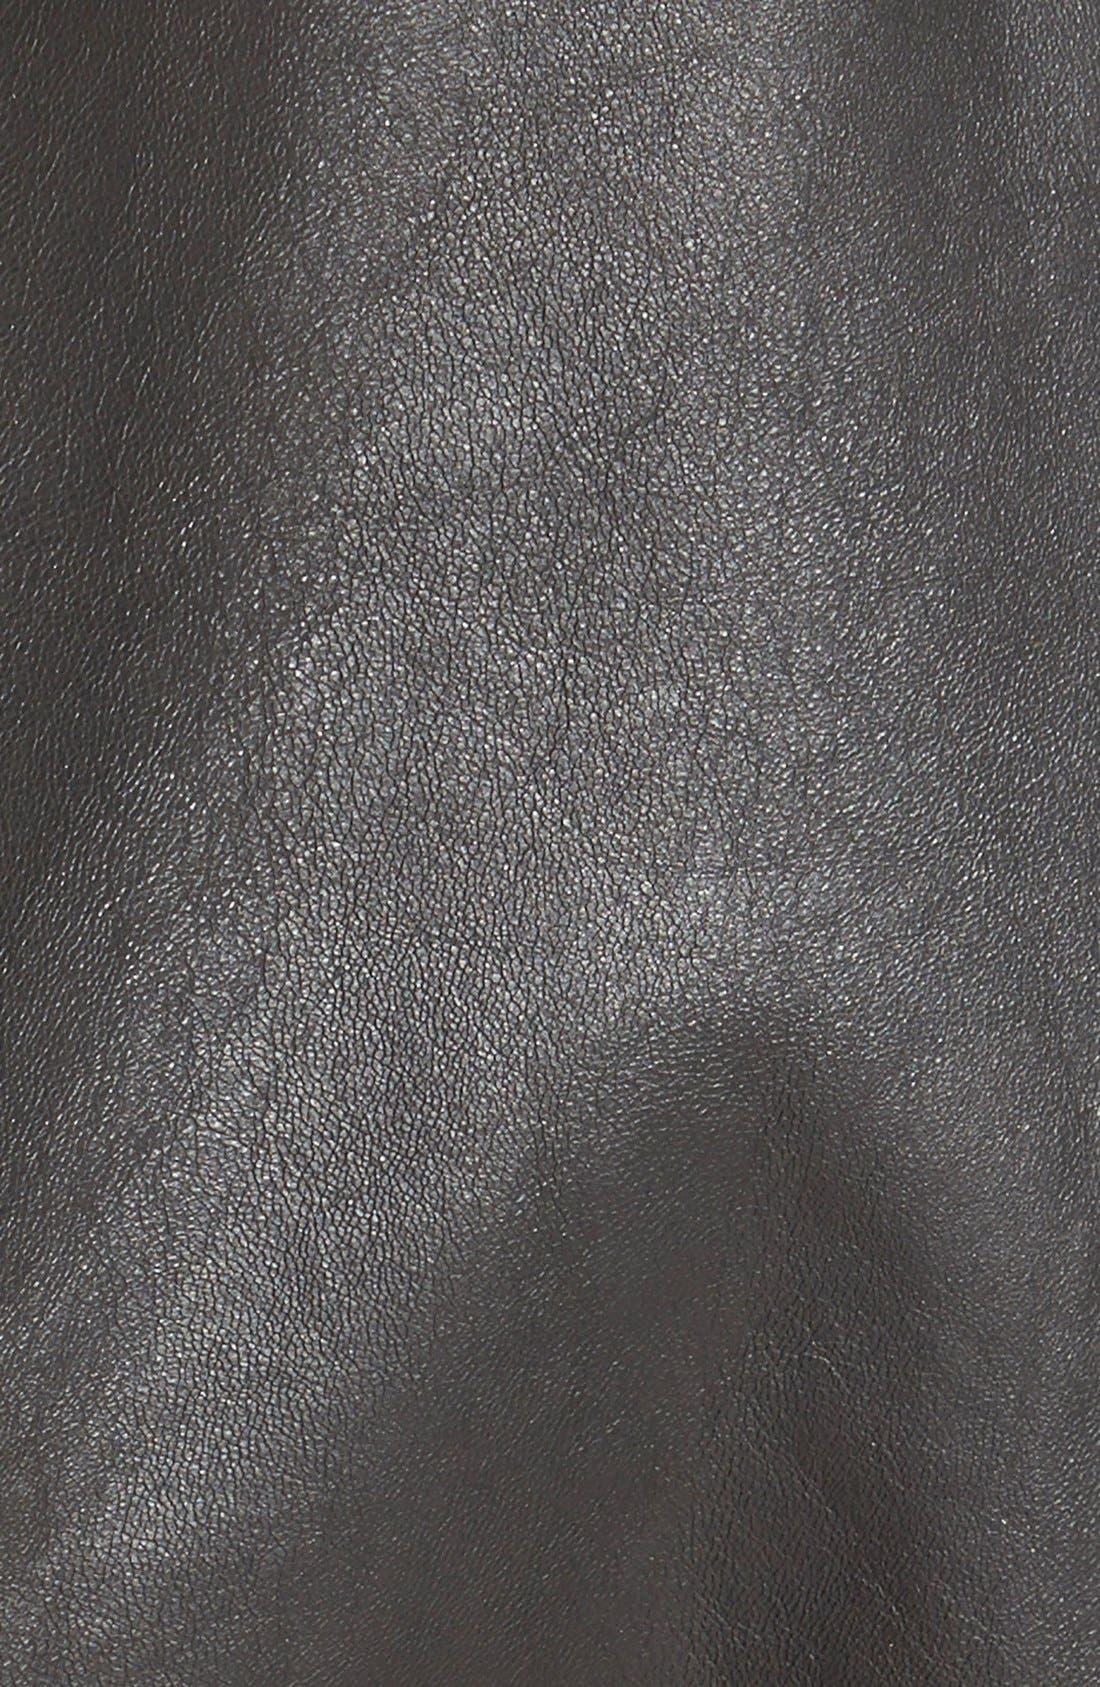 Reversible Suede Jacket,                             Alternate thumbnail 6, color,                             Chocolate